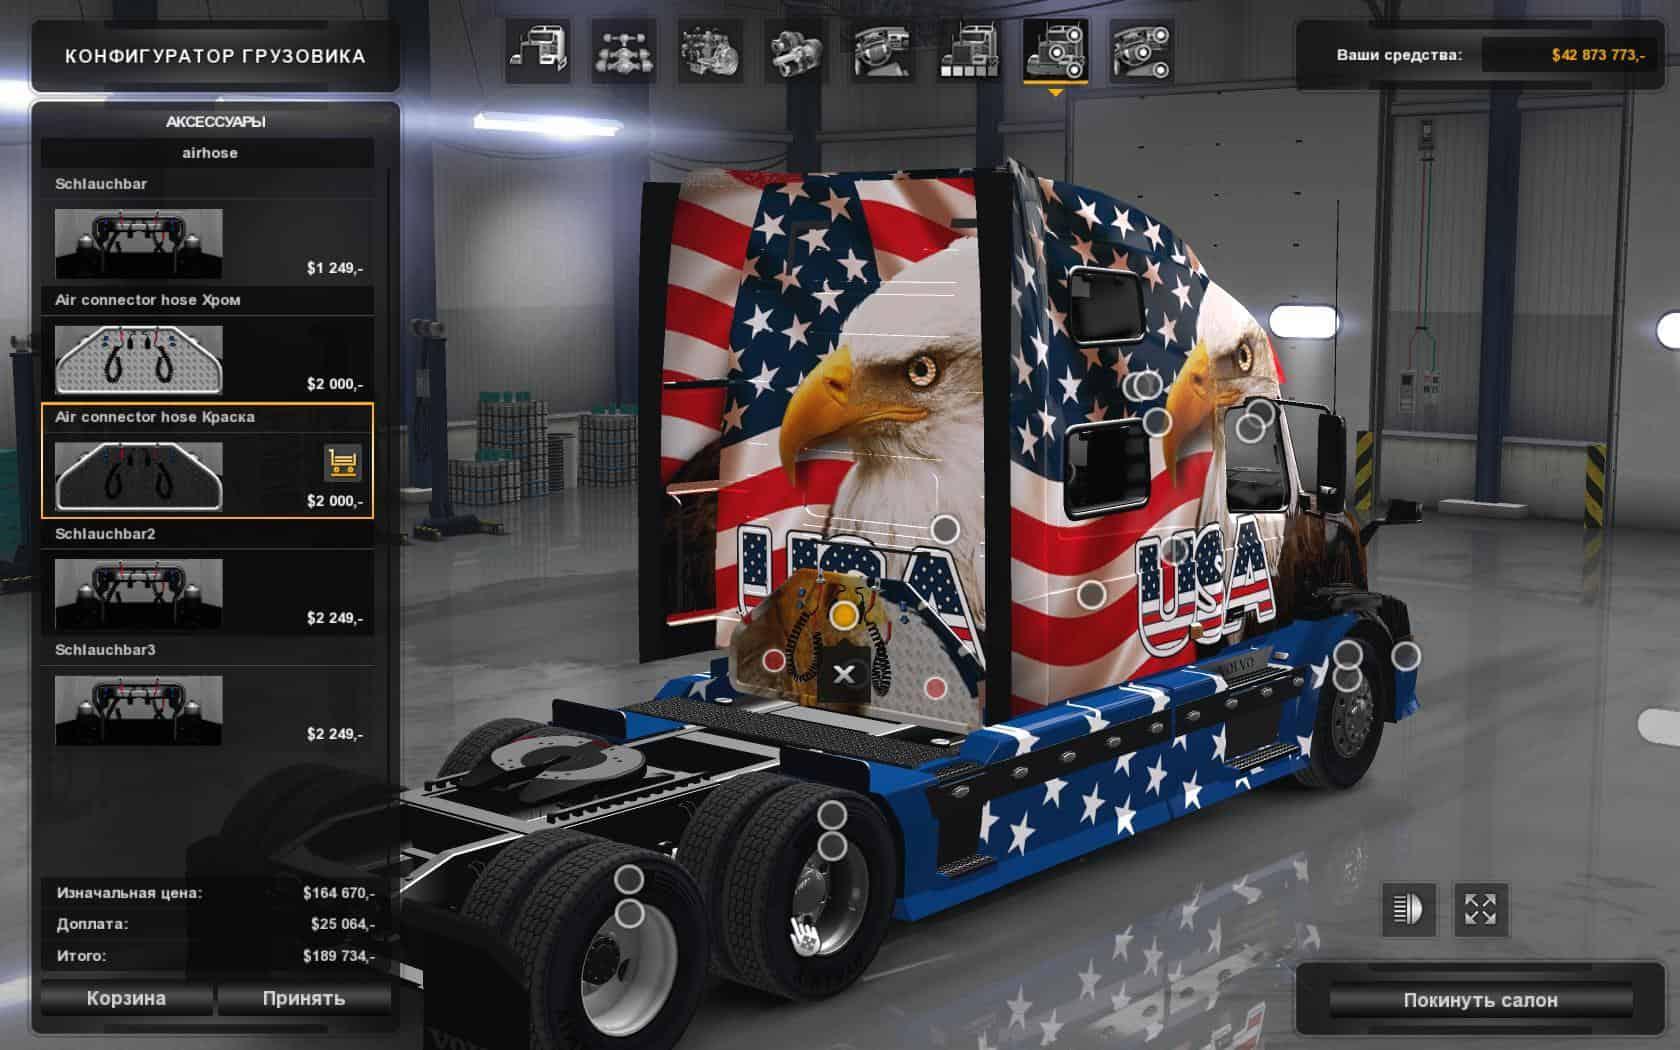 VOLVO VNL 780 REWORKED V2.0 + EDITE SKIN MOD - American Truck Simulator mod | ATS mod